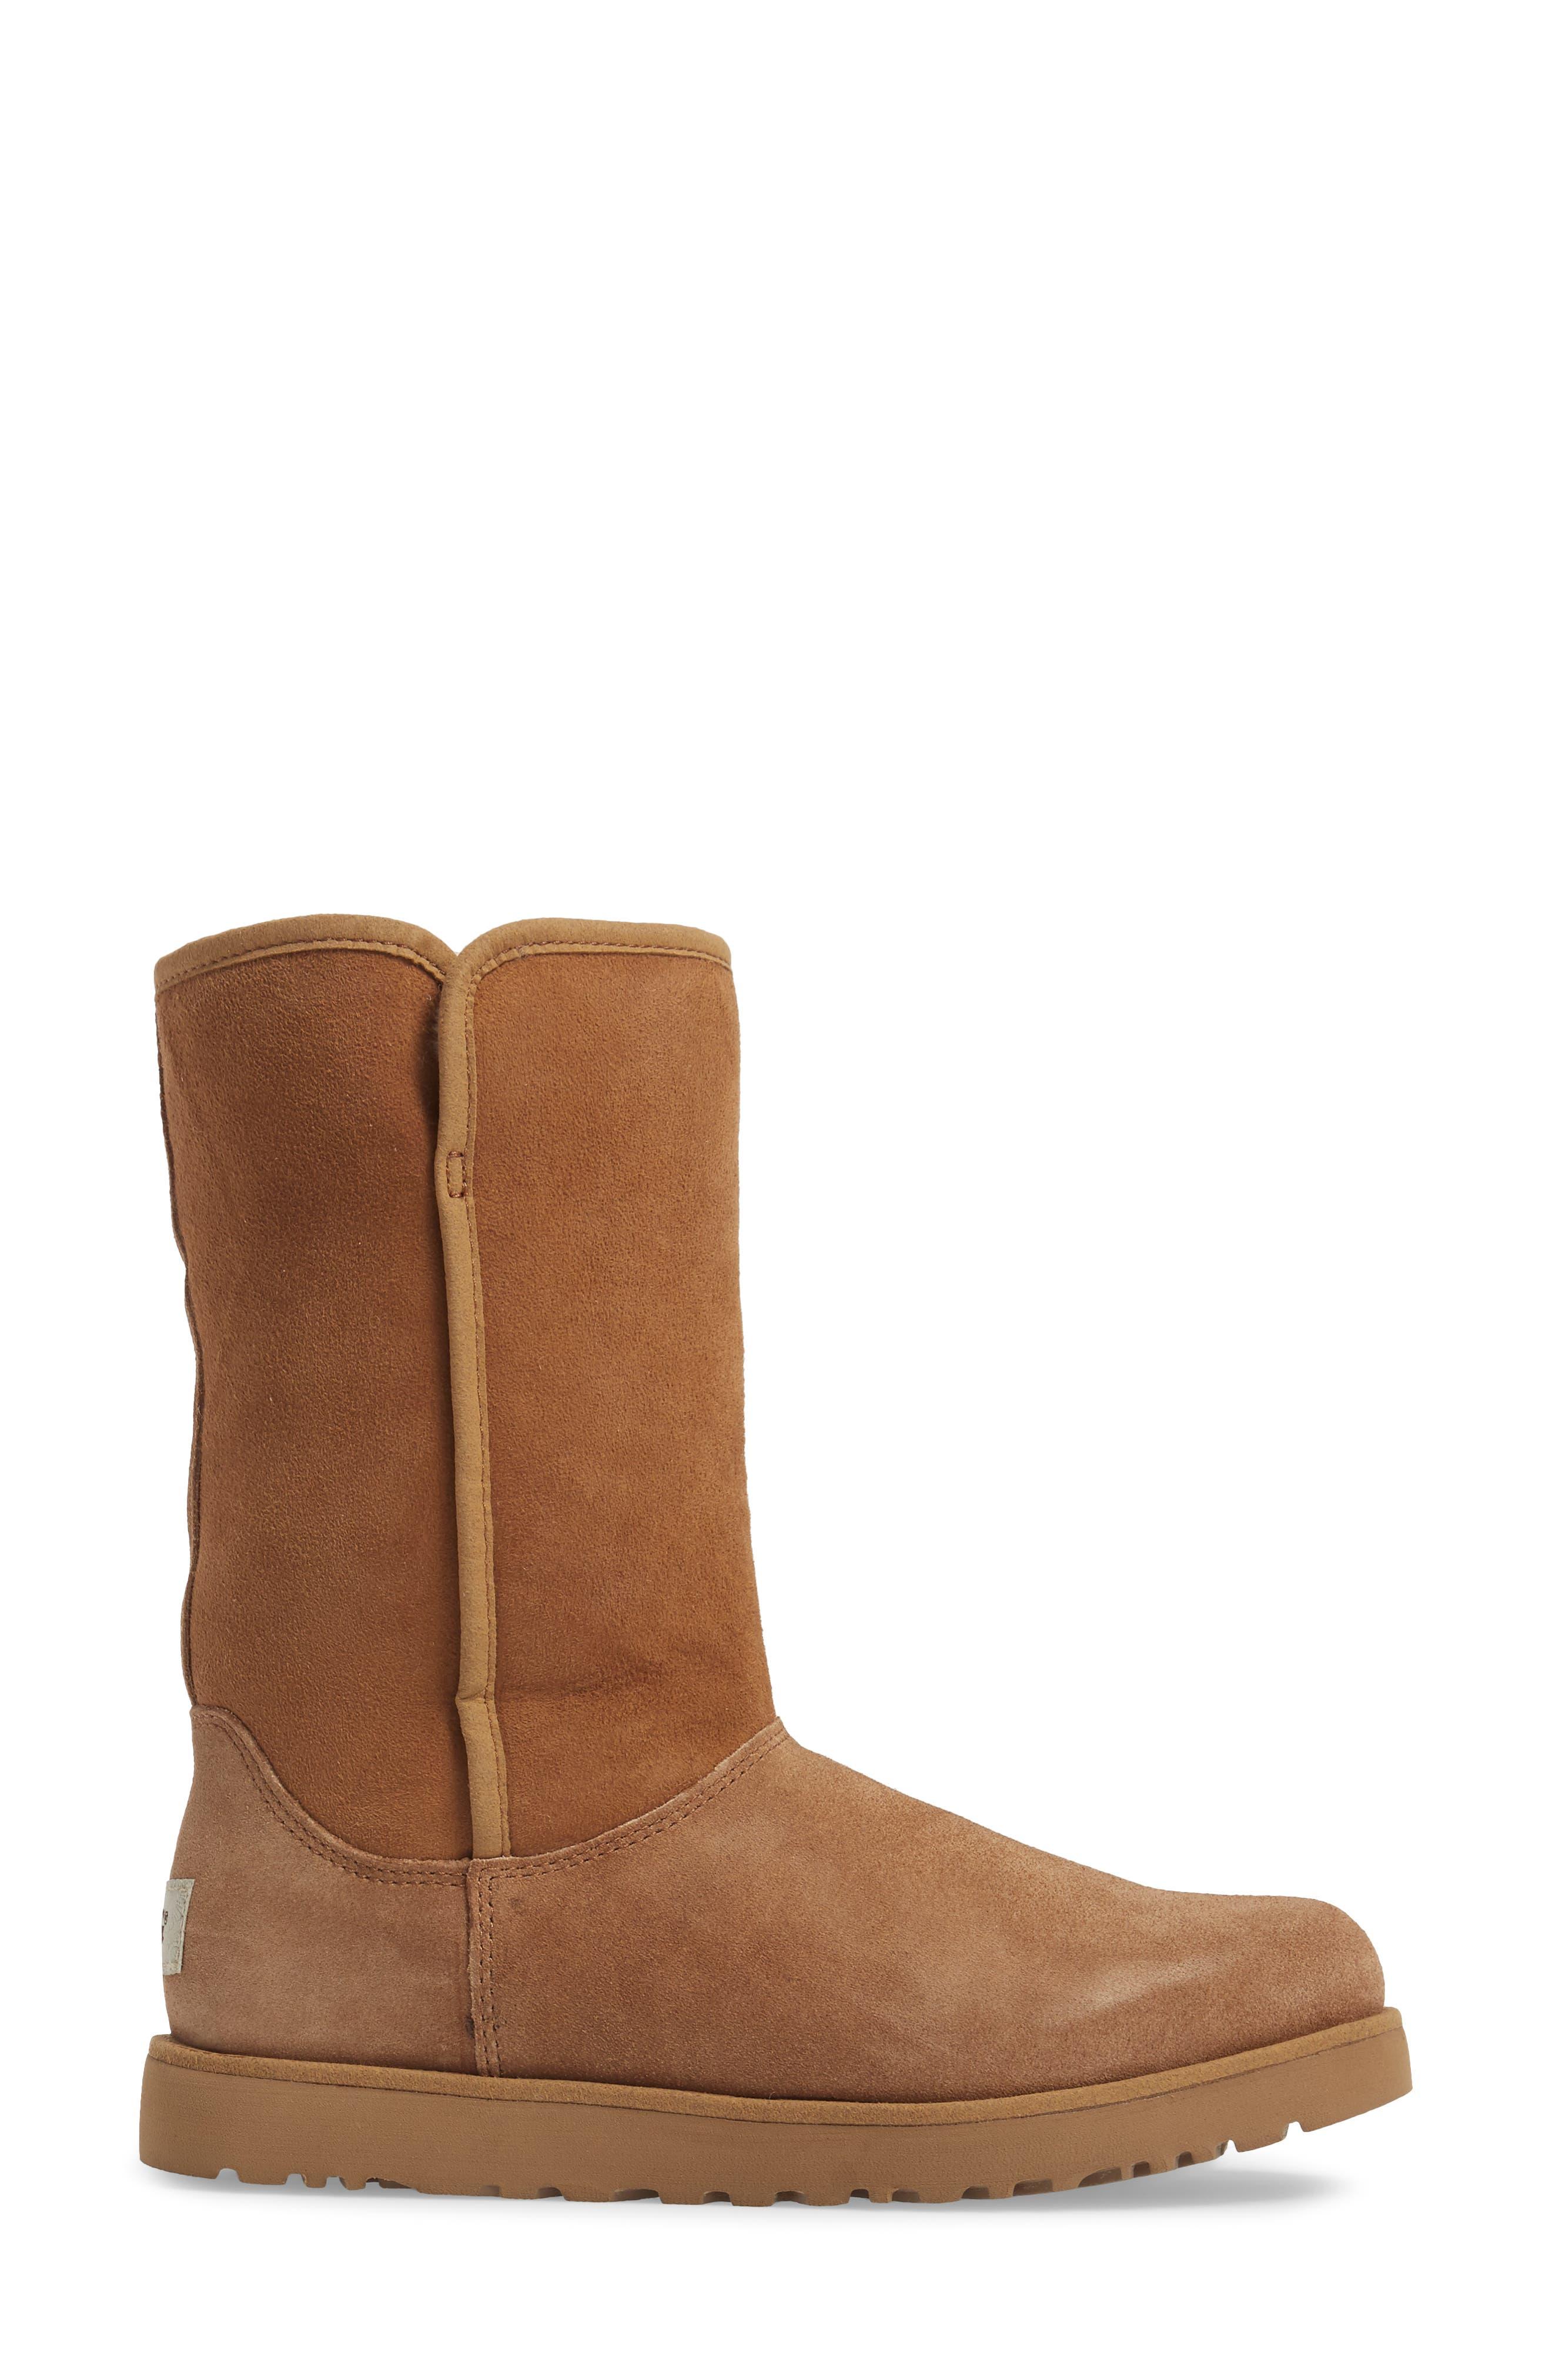 Alternate Image 3  - UGG® 'Michelle' Boot (Women)